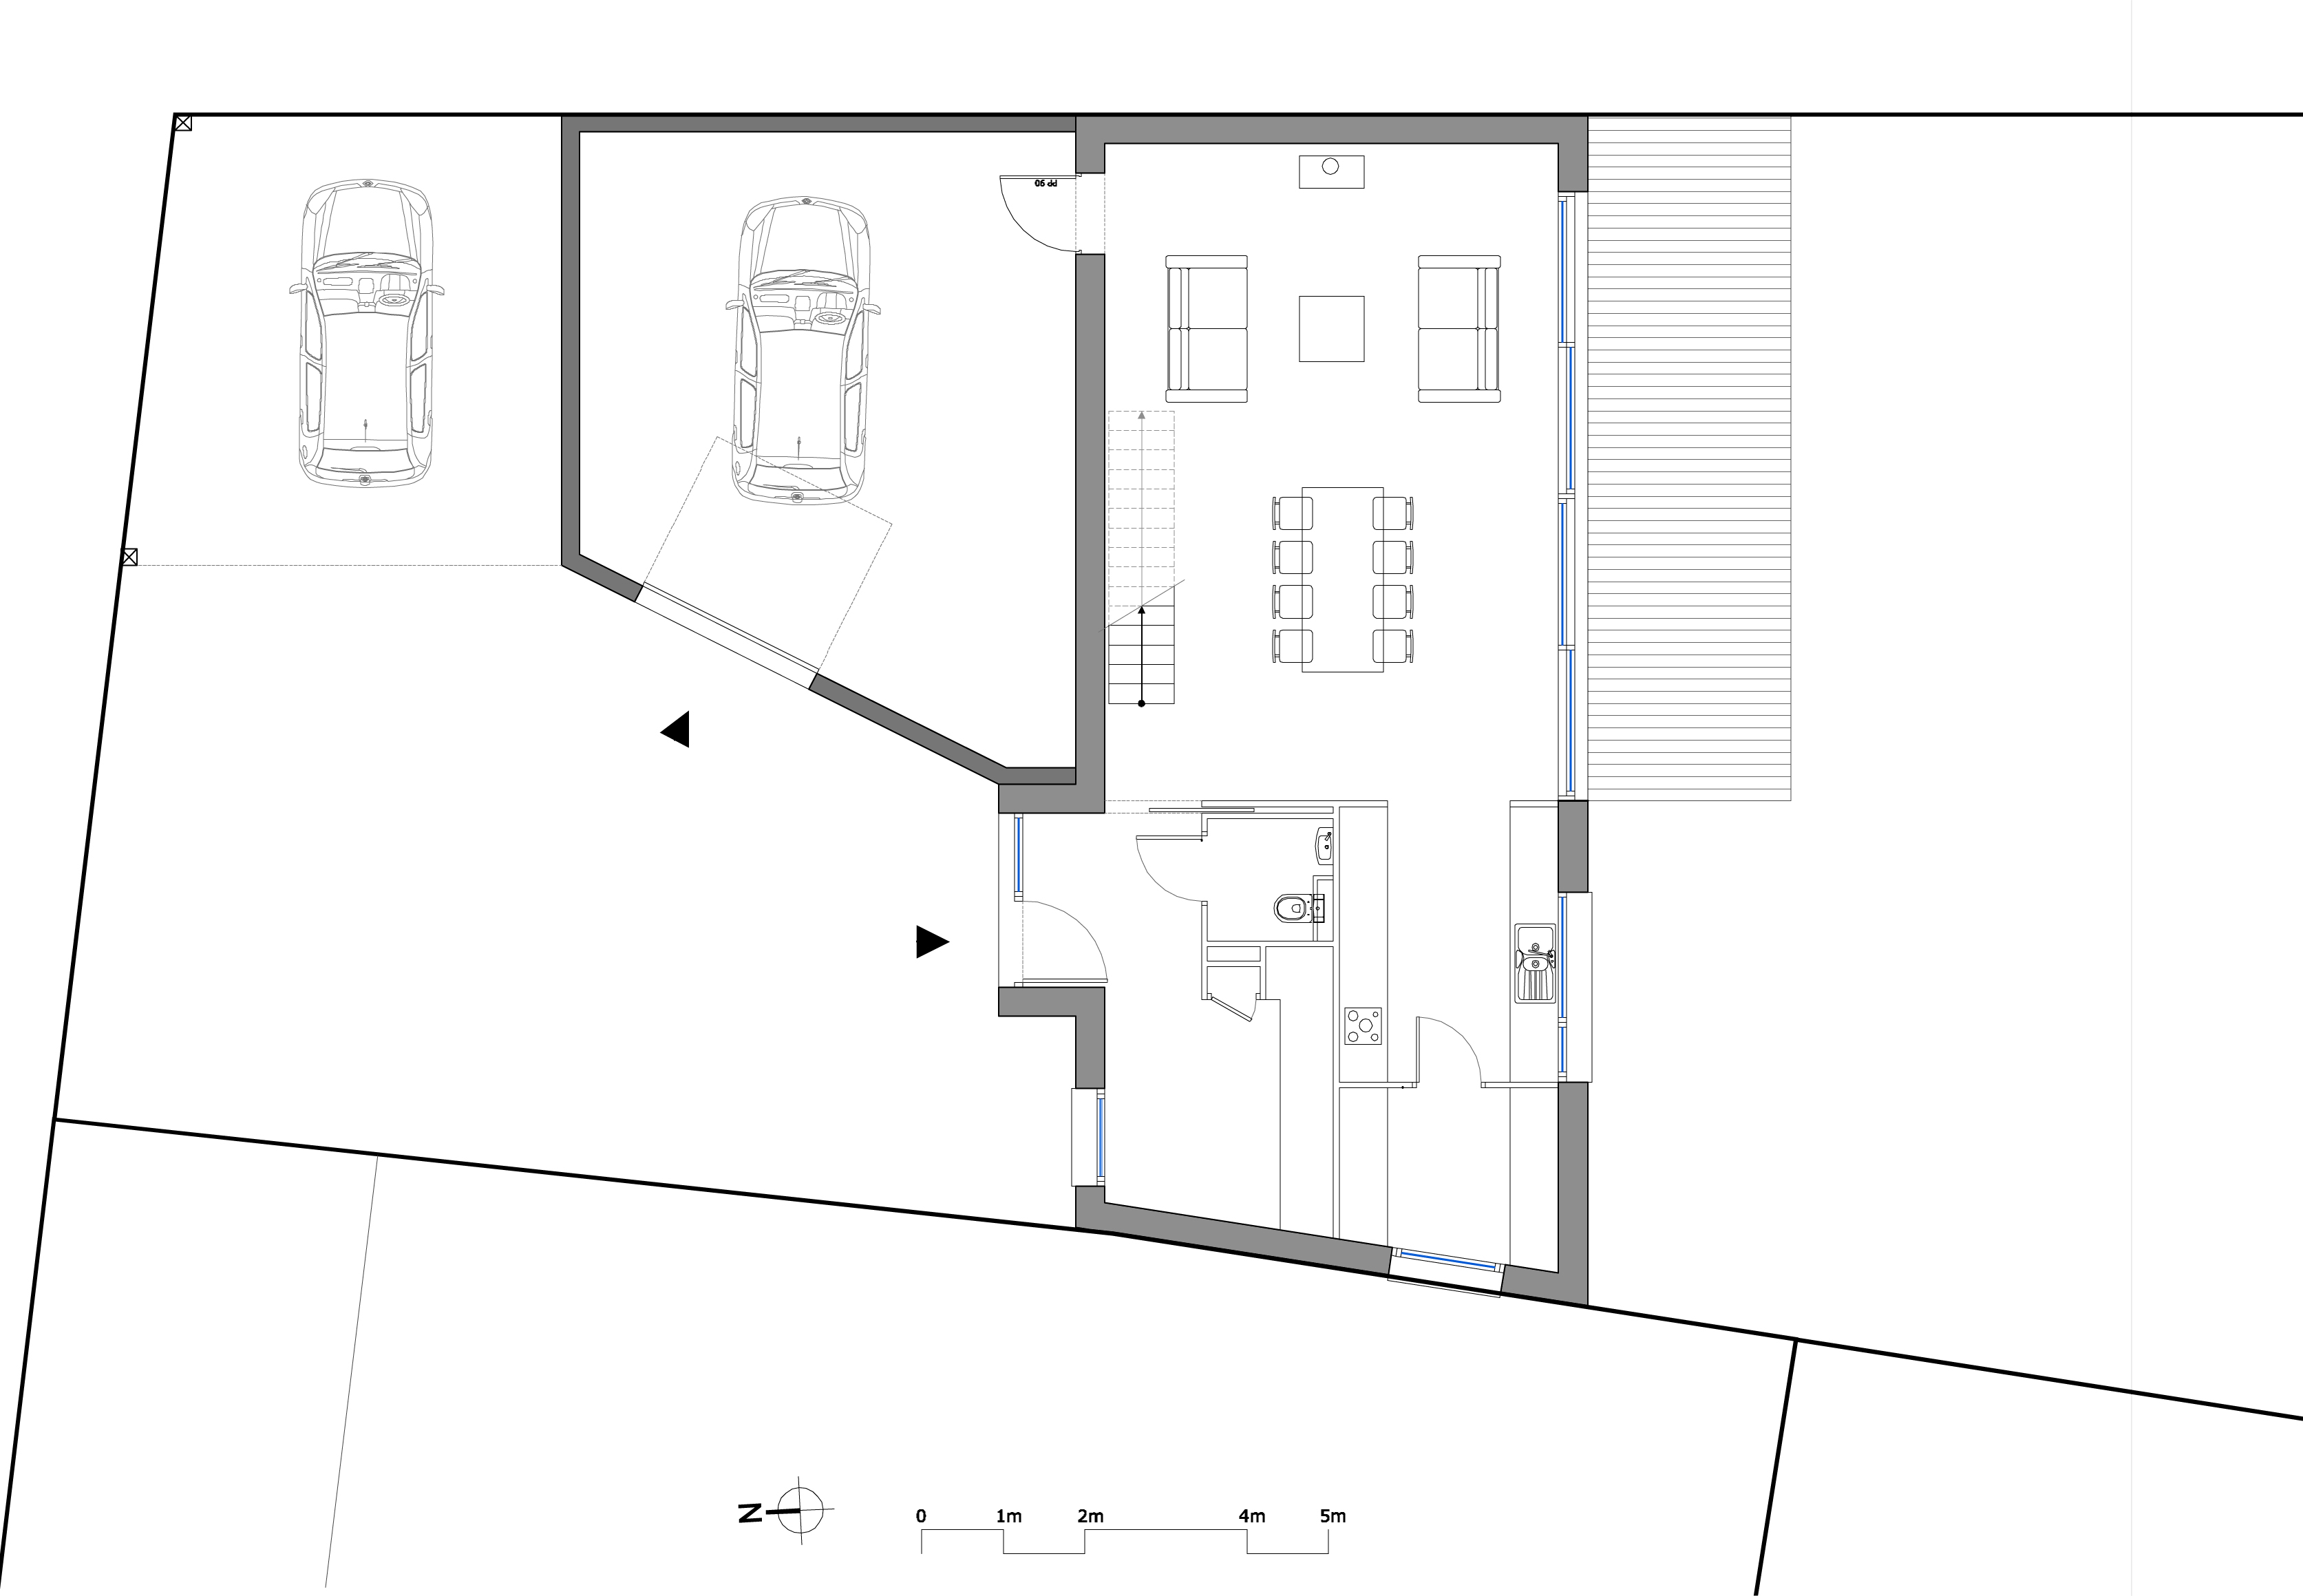 15.38 Atelier Permis de construire extension nord Cysoing8